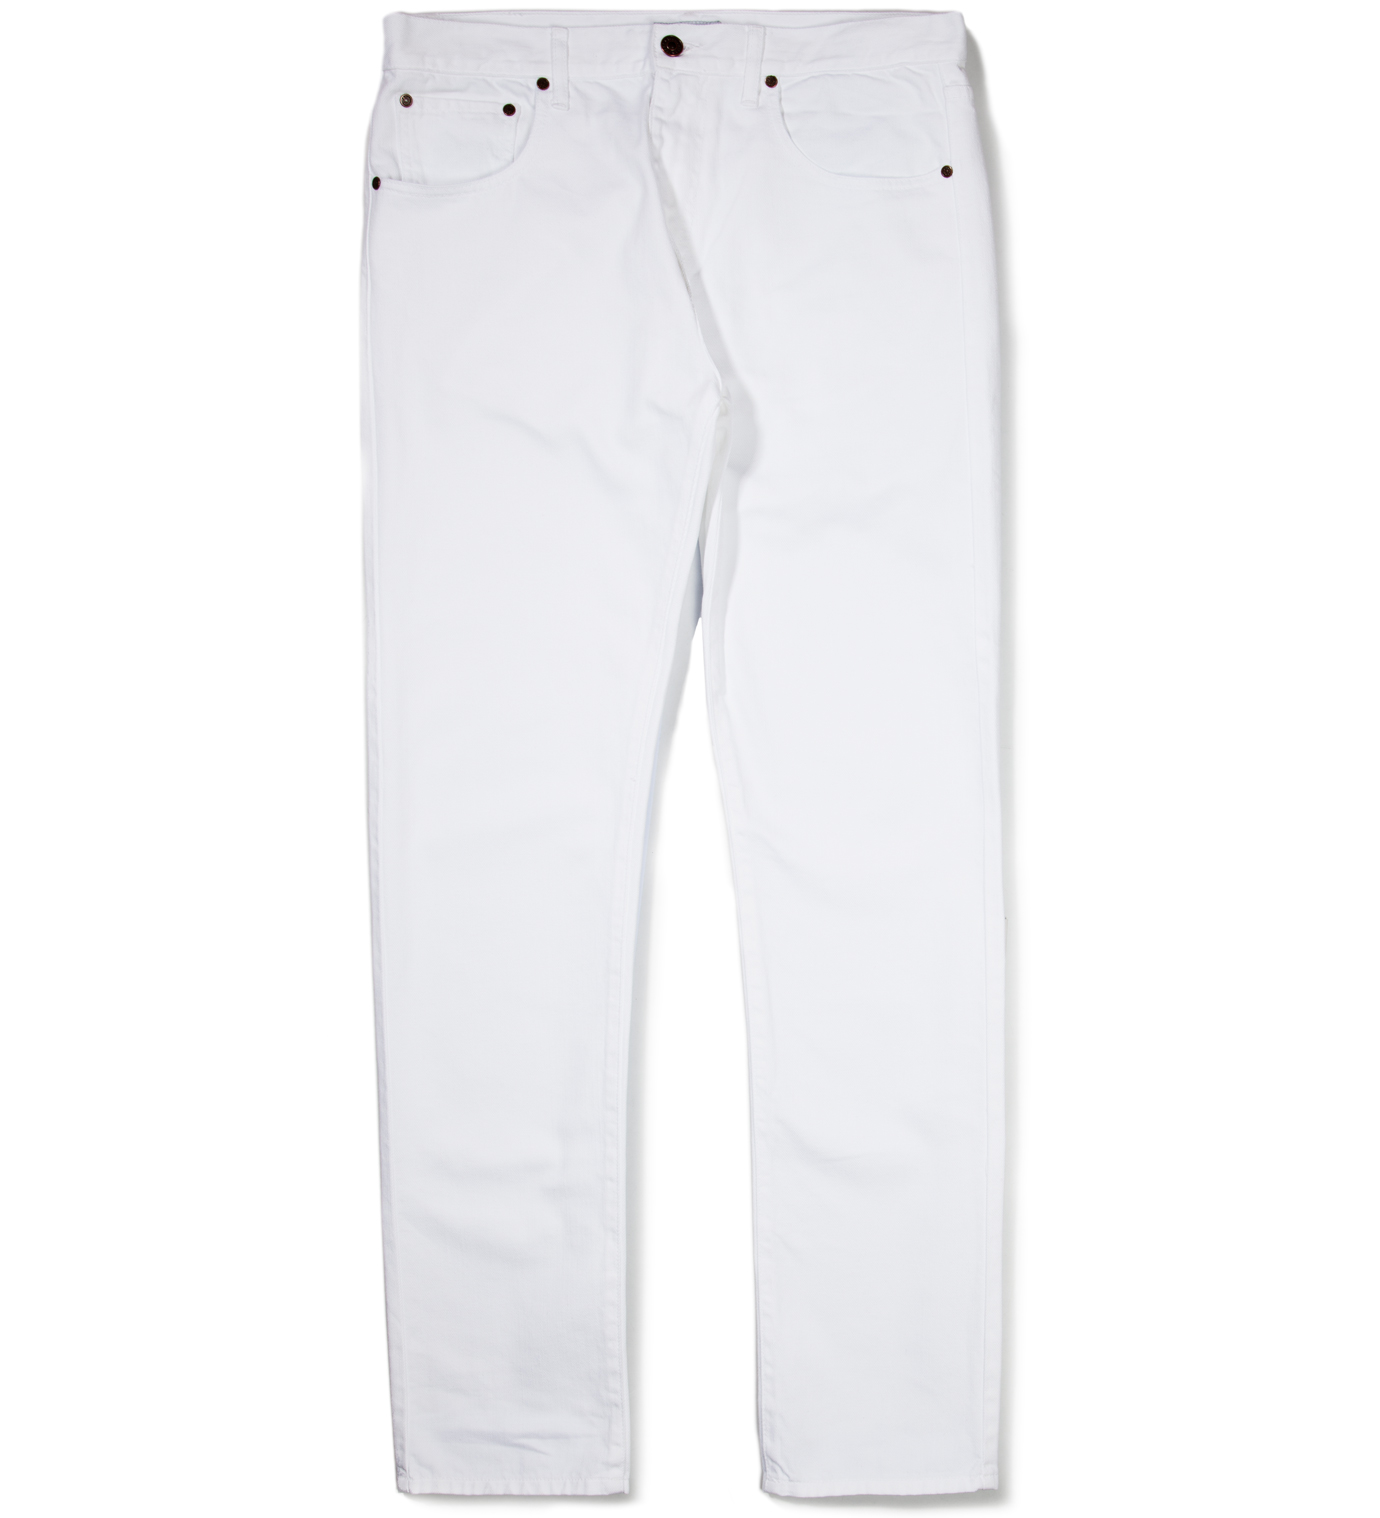 Hentsch Man White Denim Trouser Pant